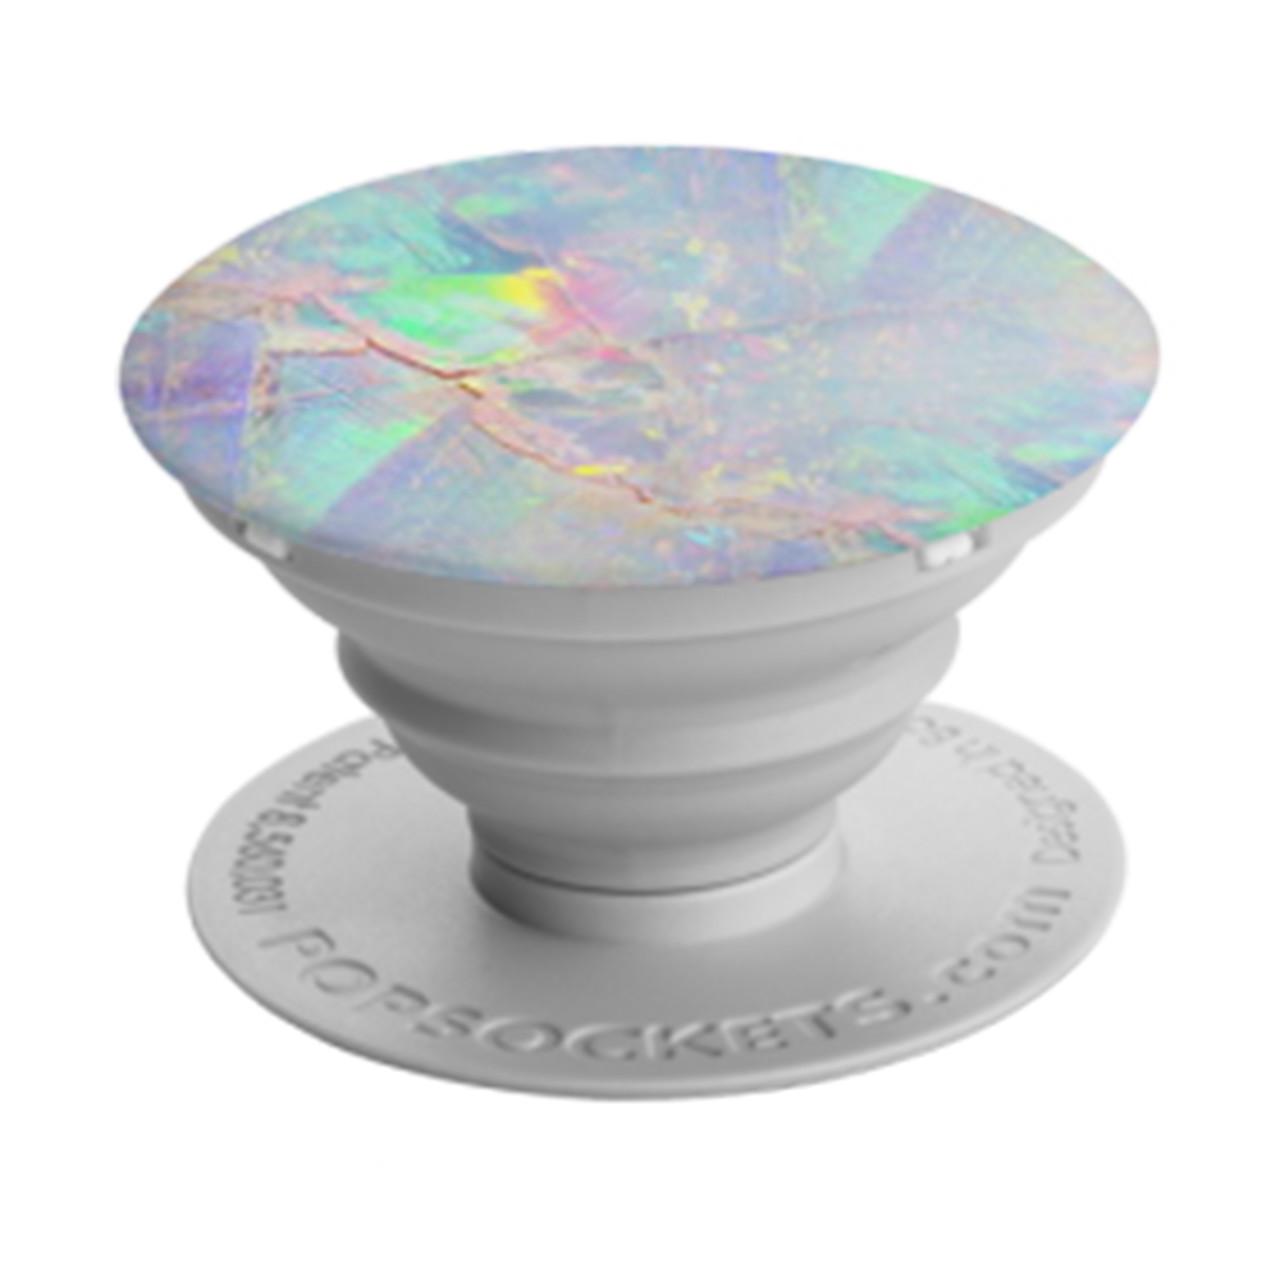 PopSockets Pop Socket Opal - ausziehbarer Griff für Handys